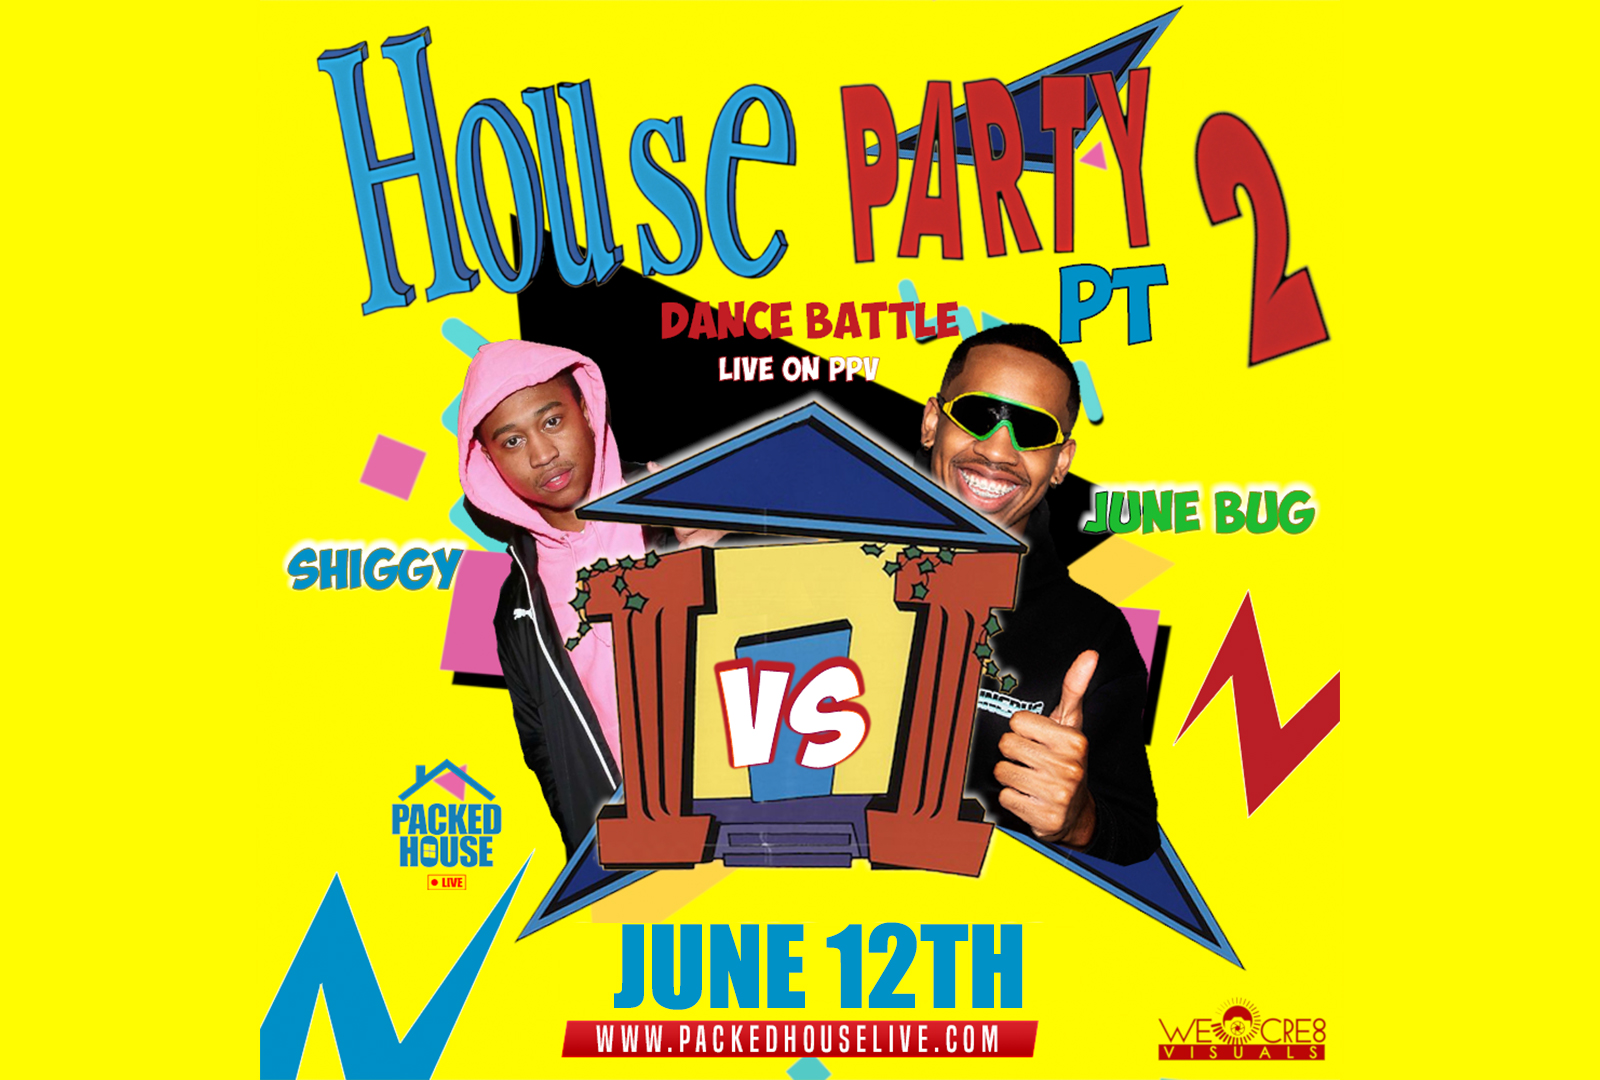 SHIGGY vs. JUNEBUG - House Party Dance Battle